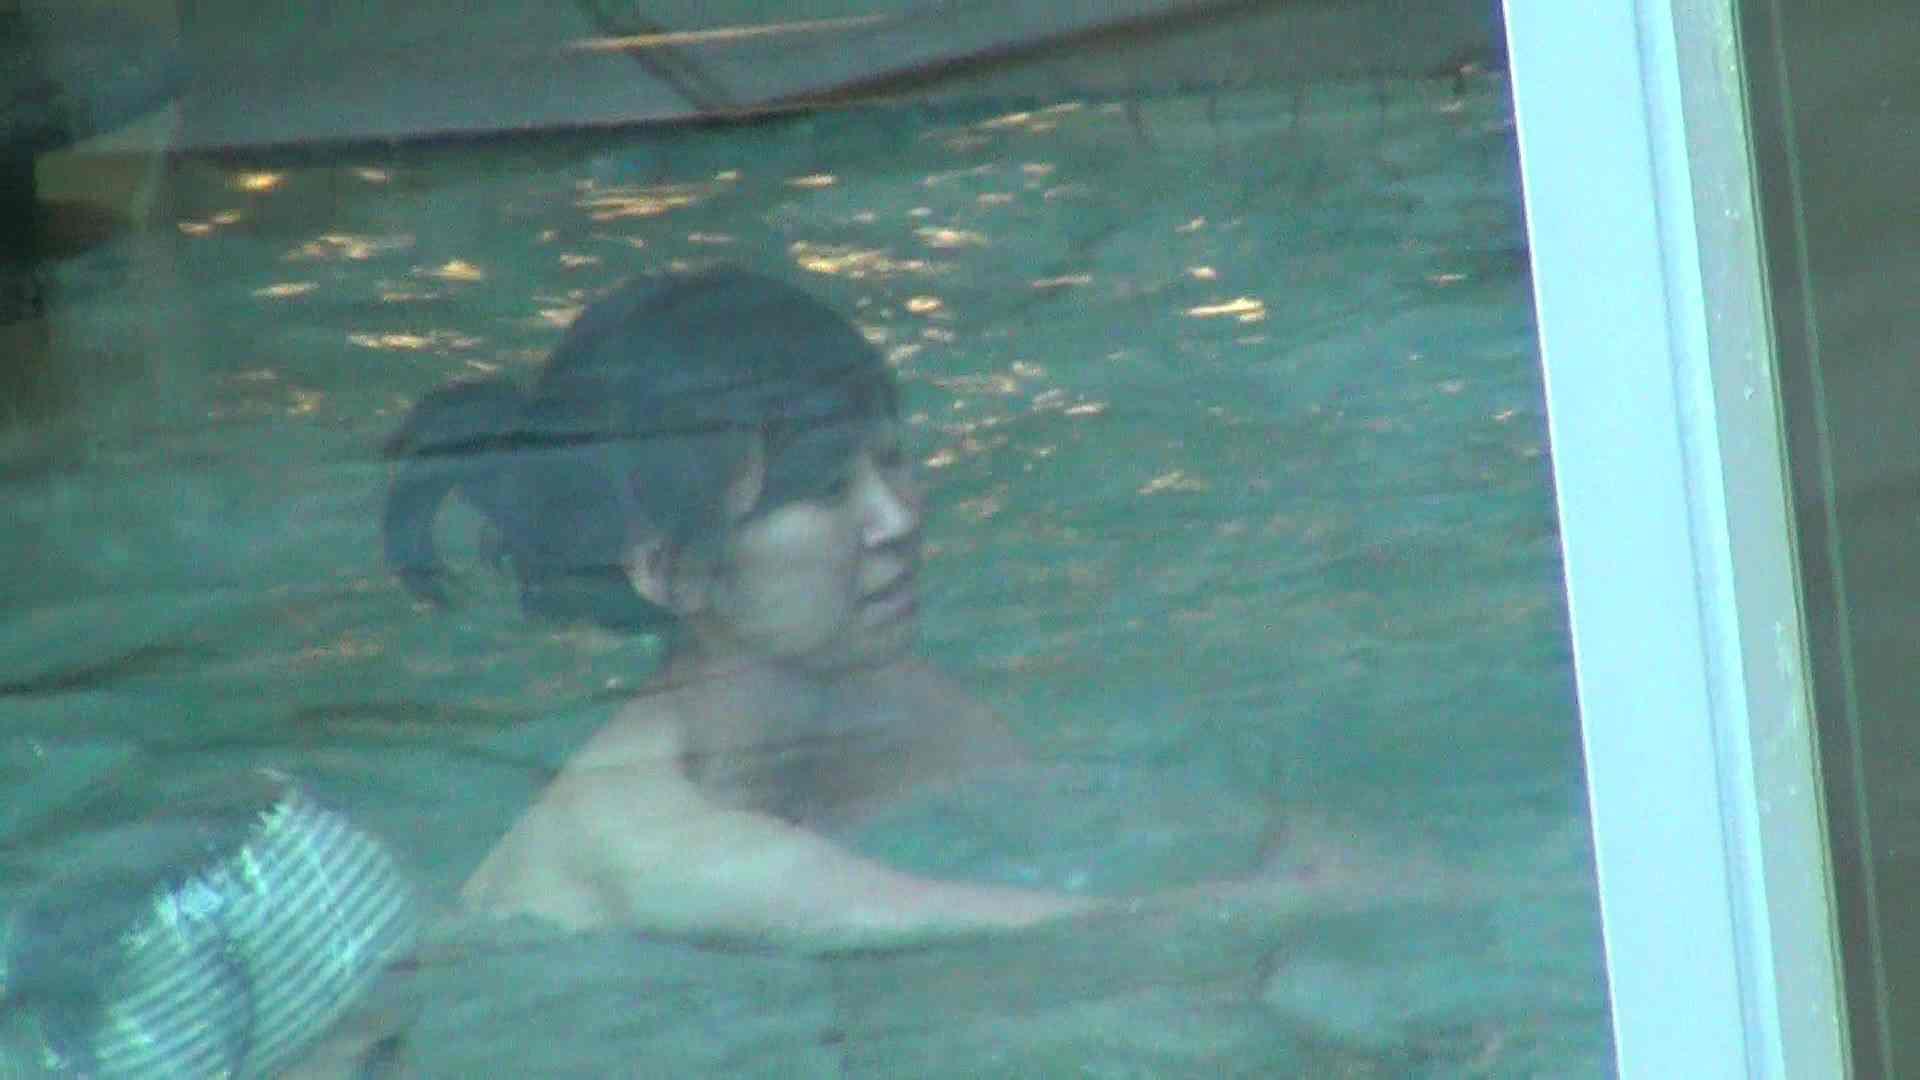 Aquaな露天風呂Vol.294 綺麗なOLたち  84枚 78